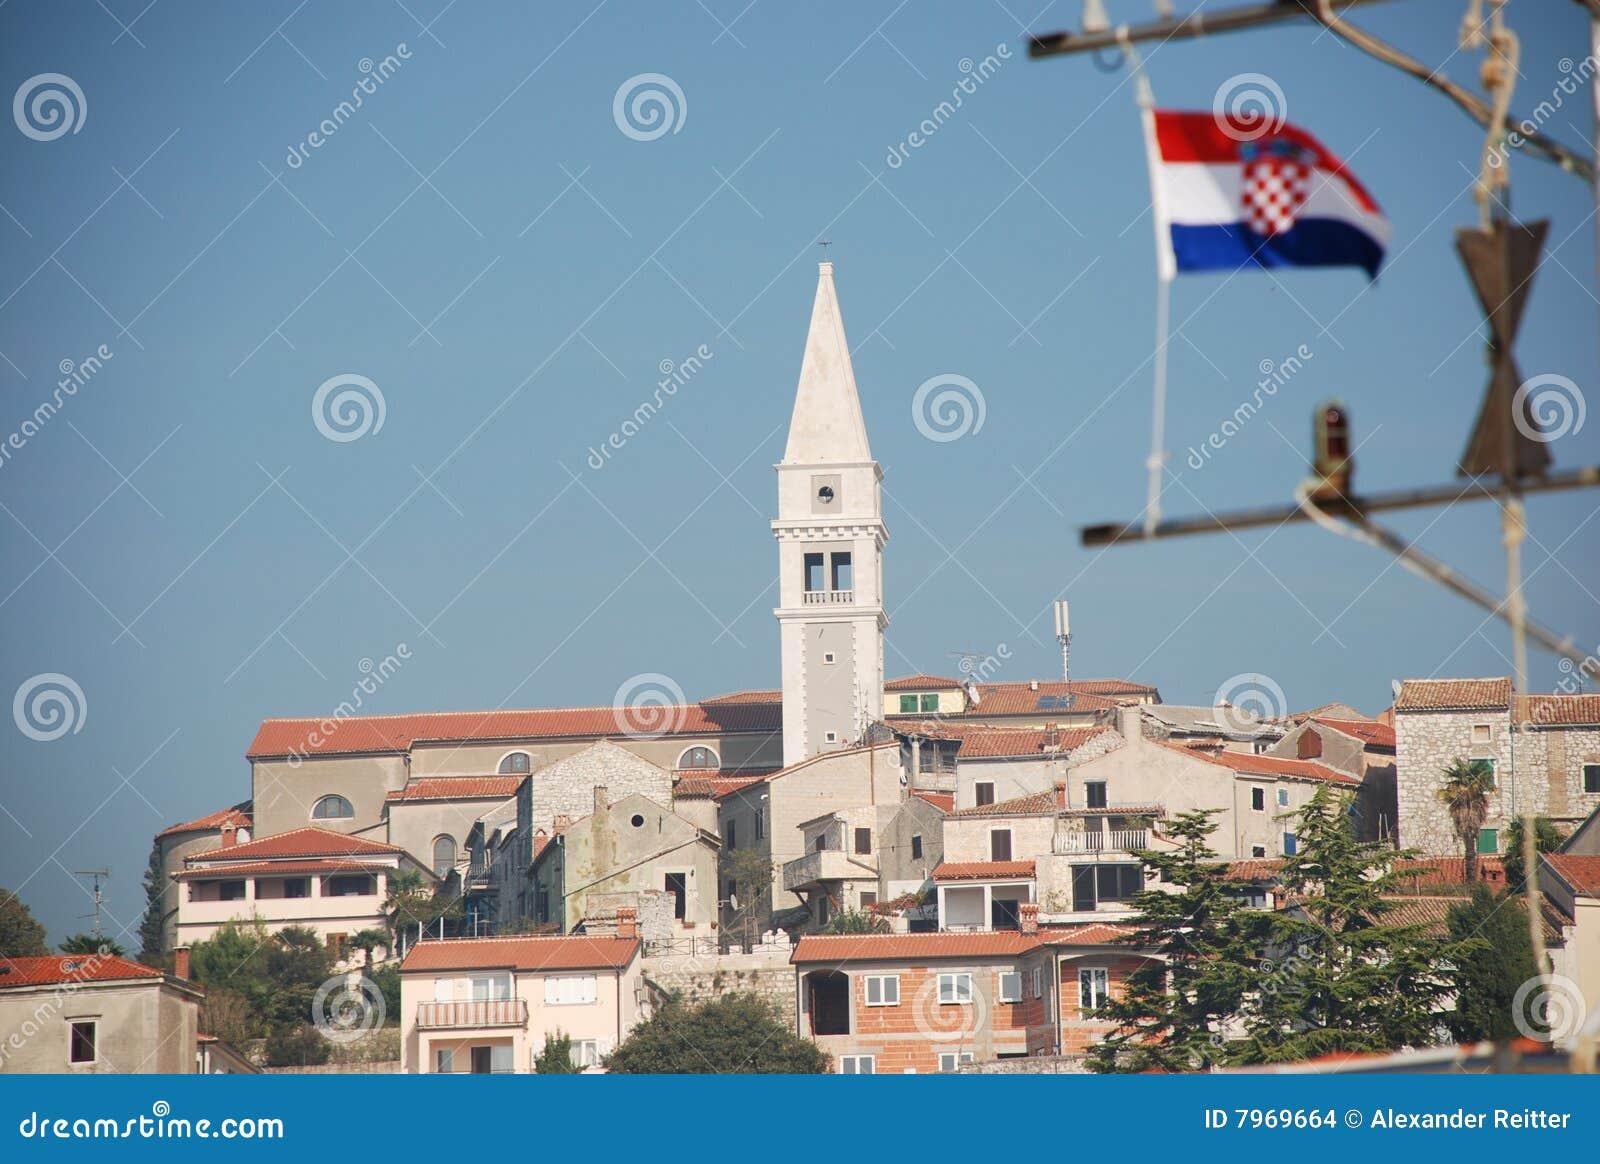 Хорватия vrsar